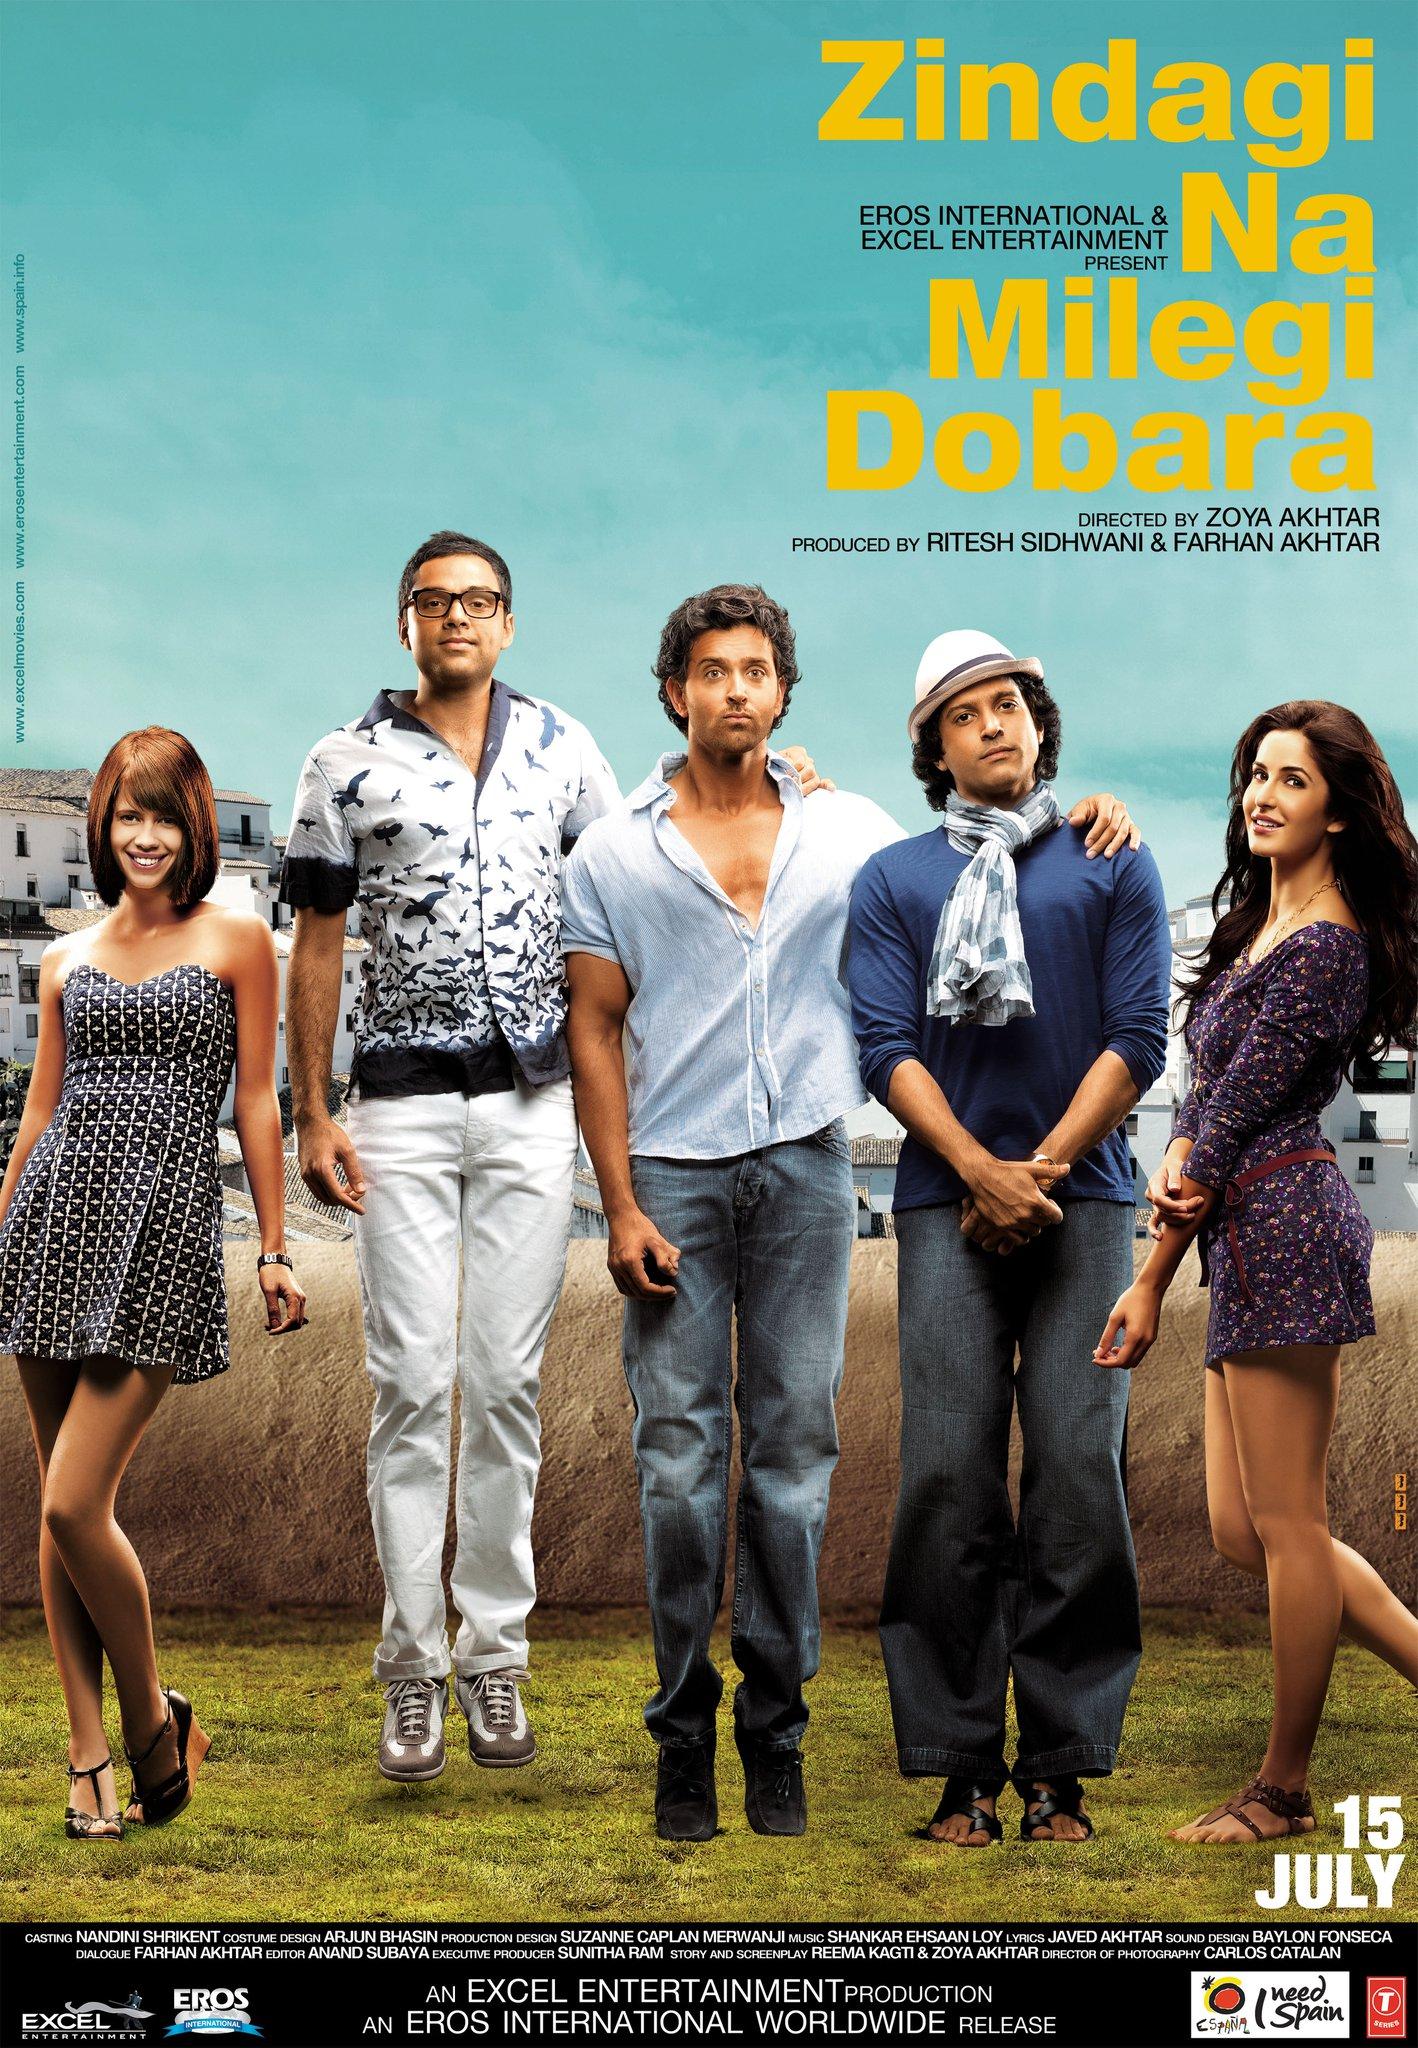 Watch Hrithik Roshan's Greatest Movies During Lockdown! 10